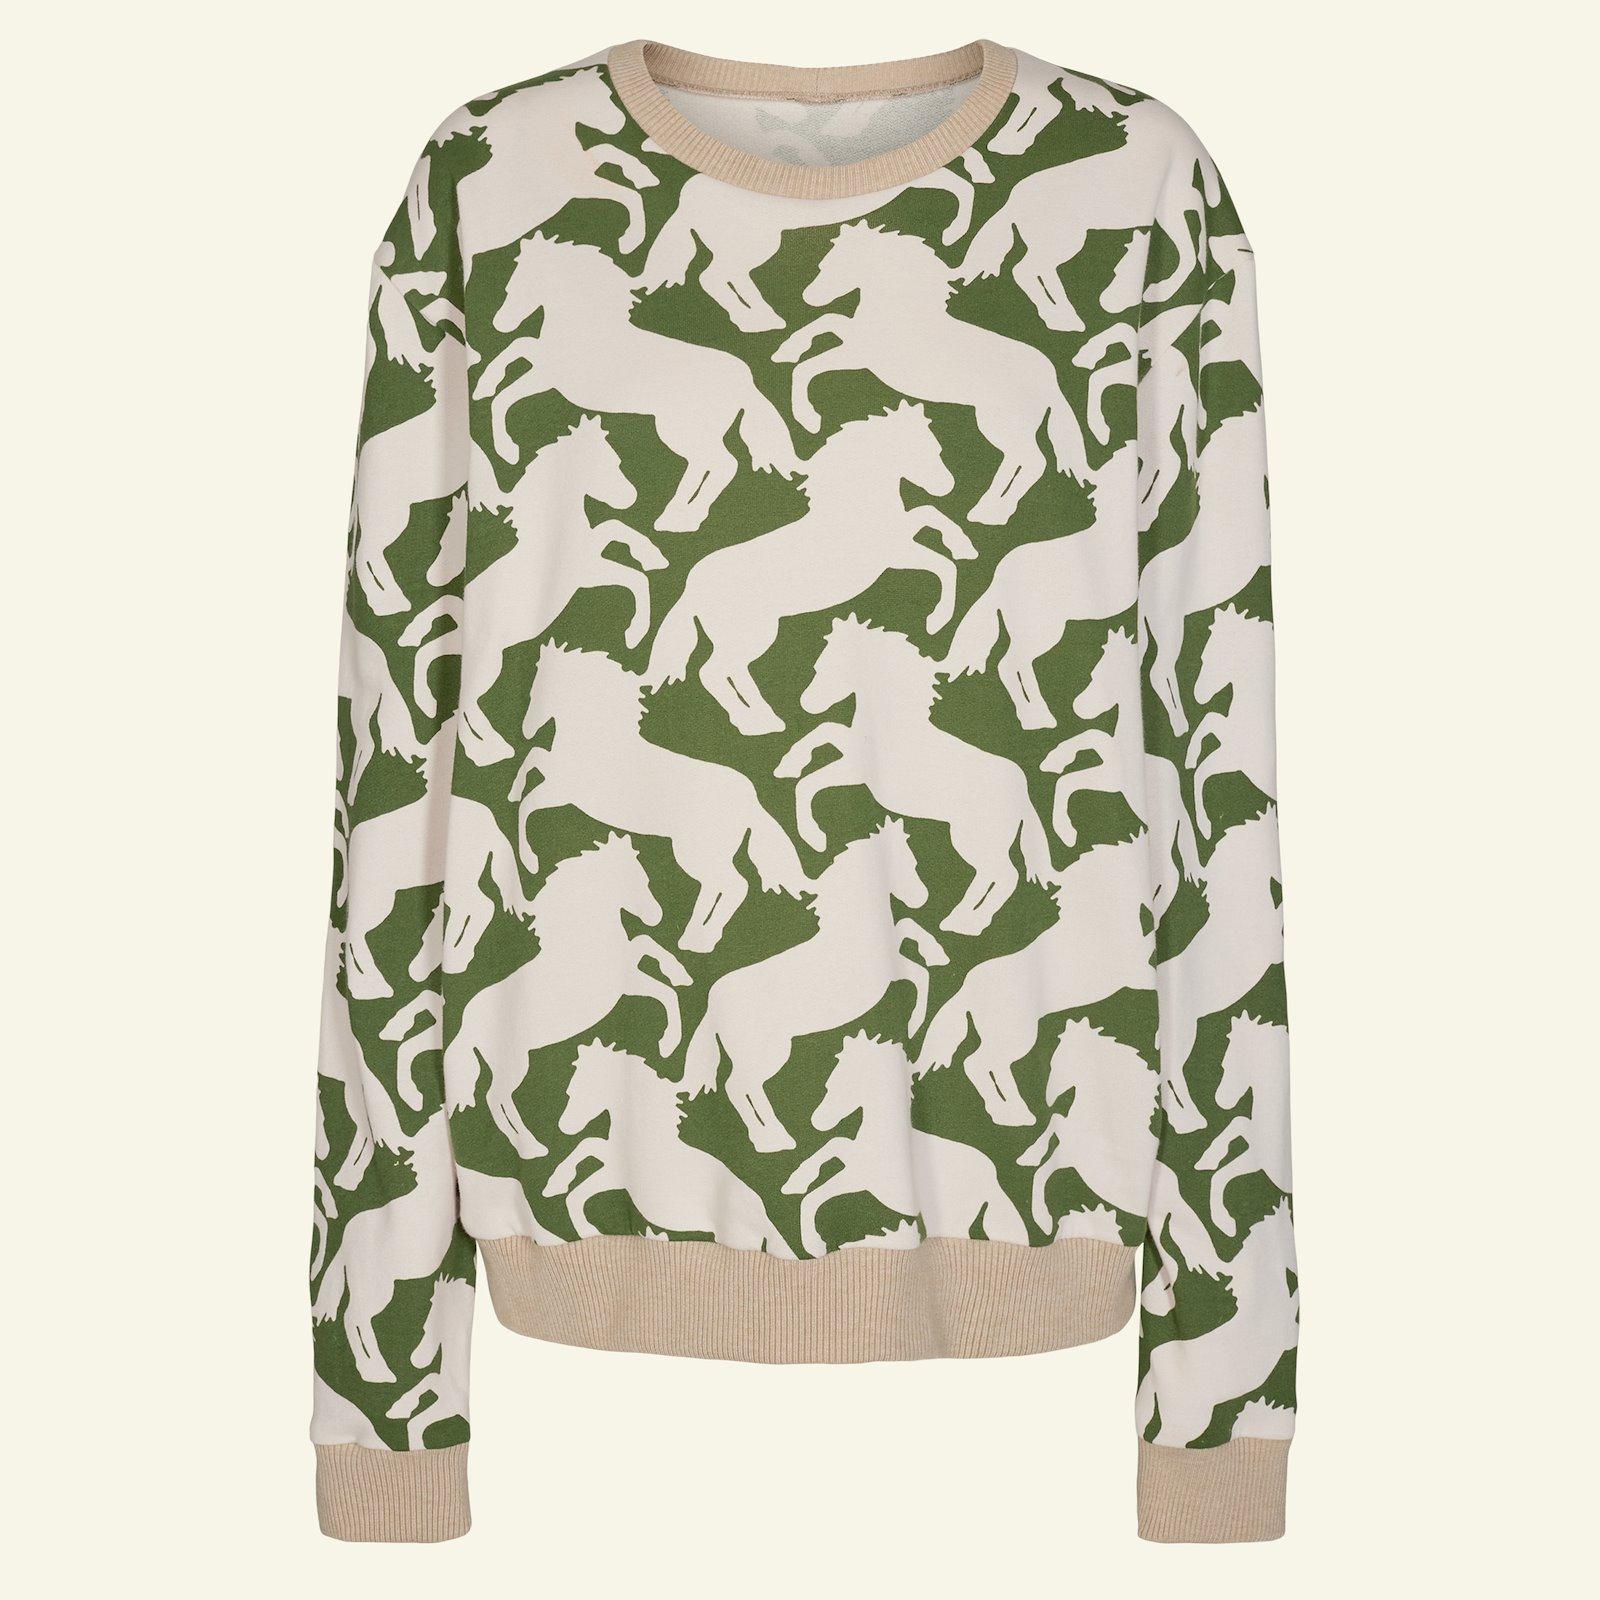 Sweatshirts, S p87002_211788_96040_sskit